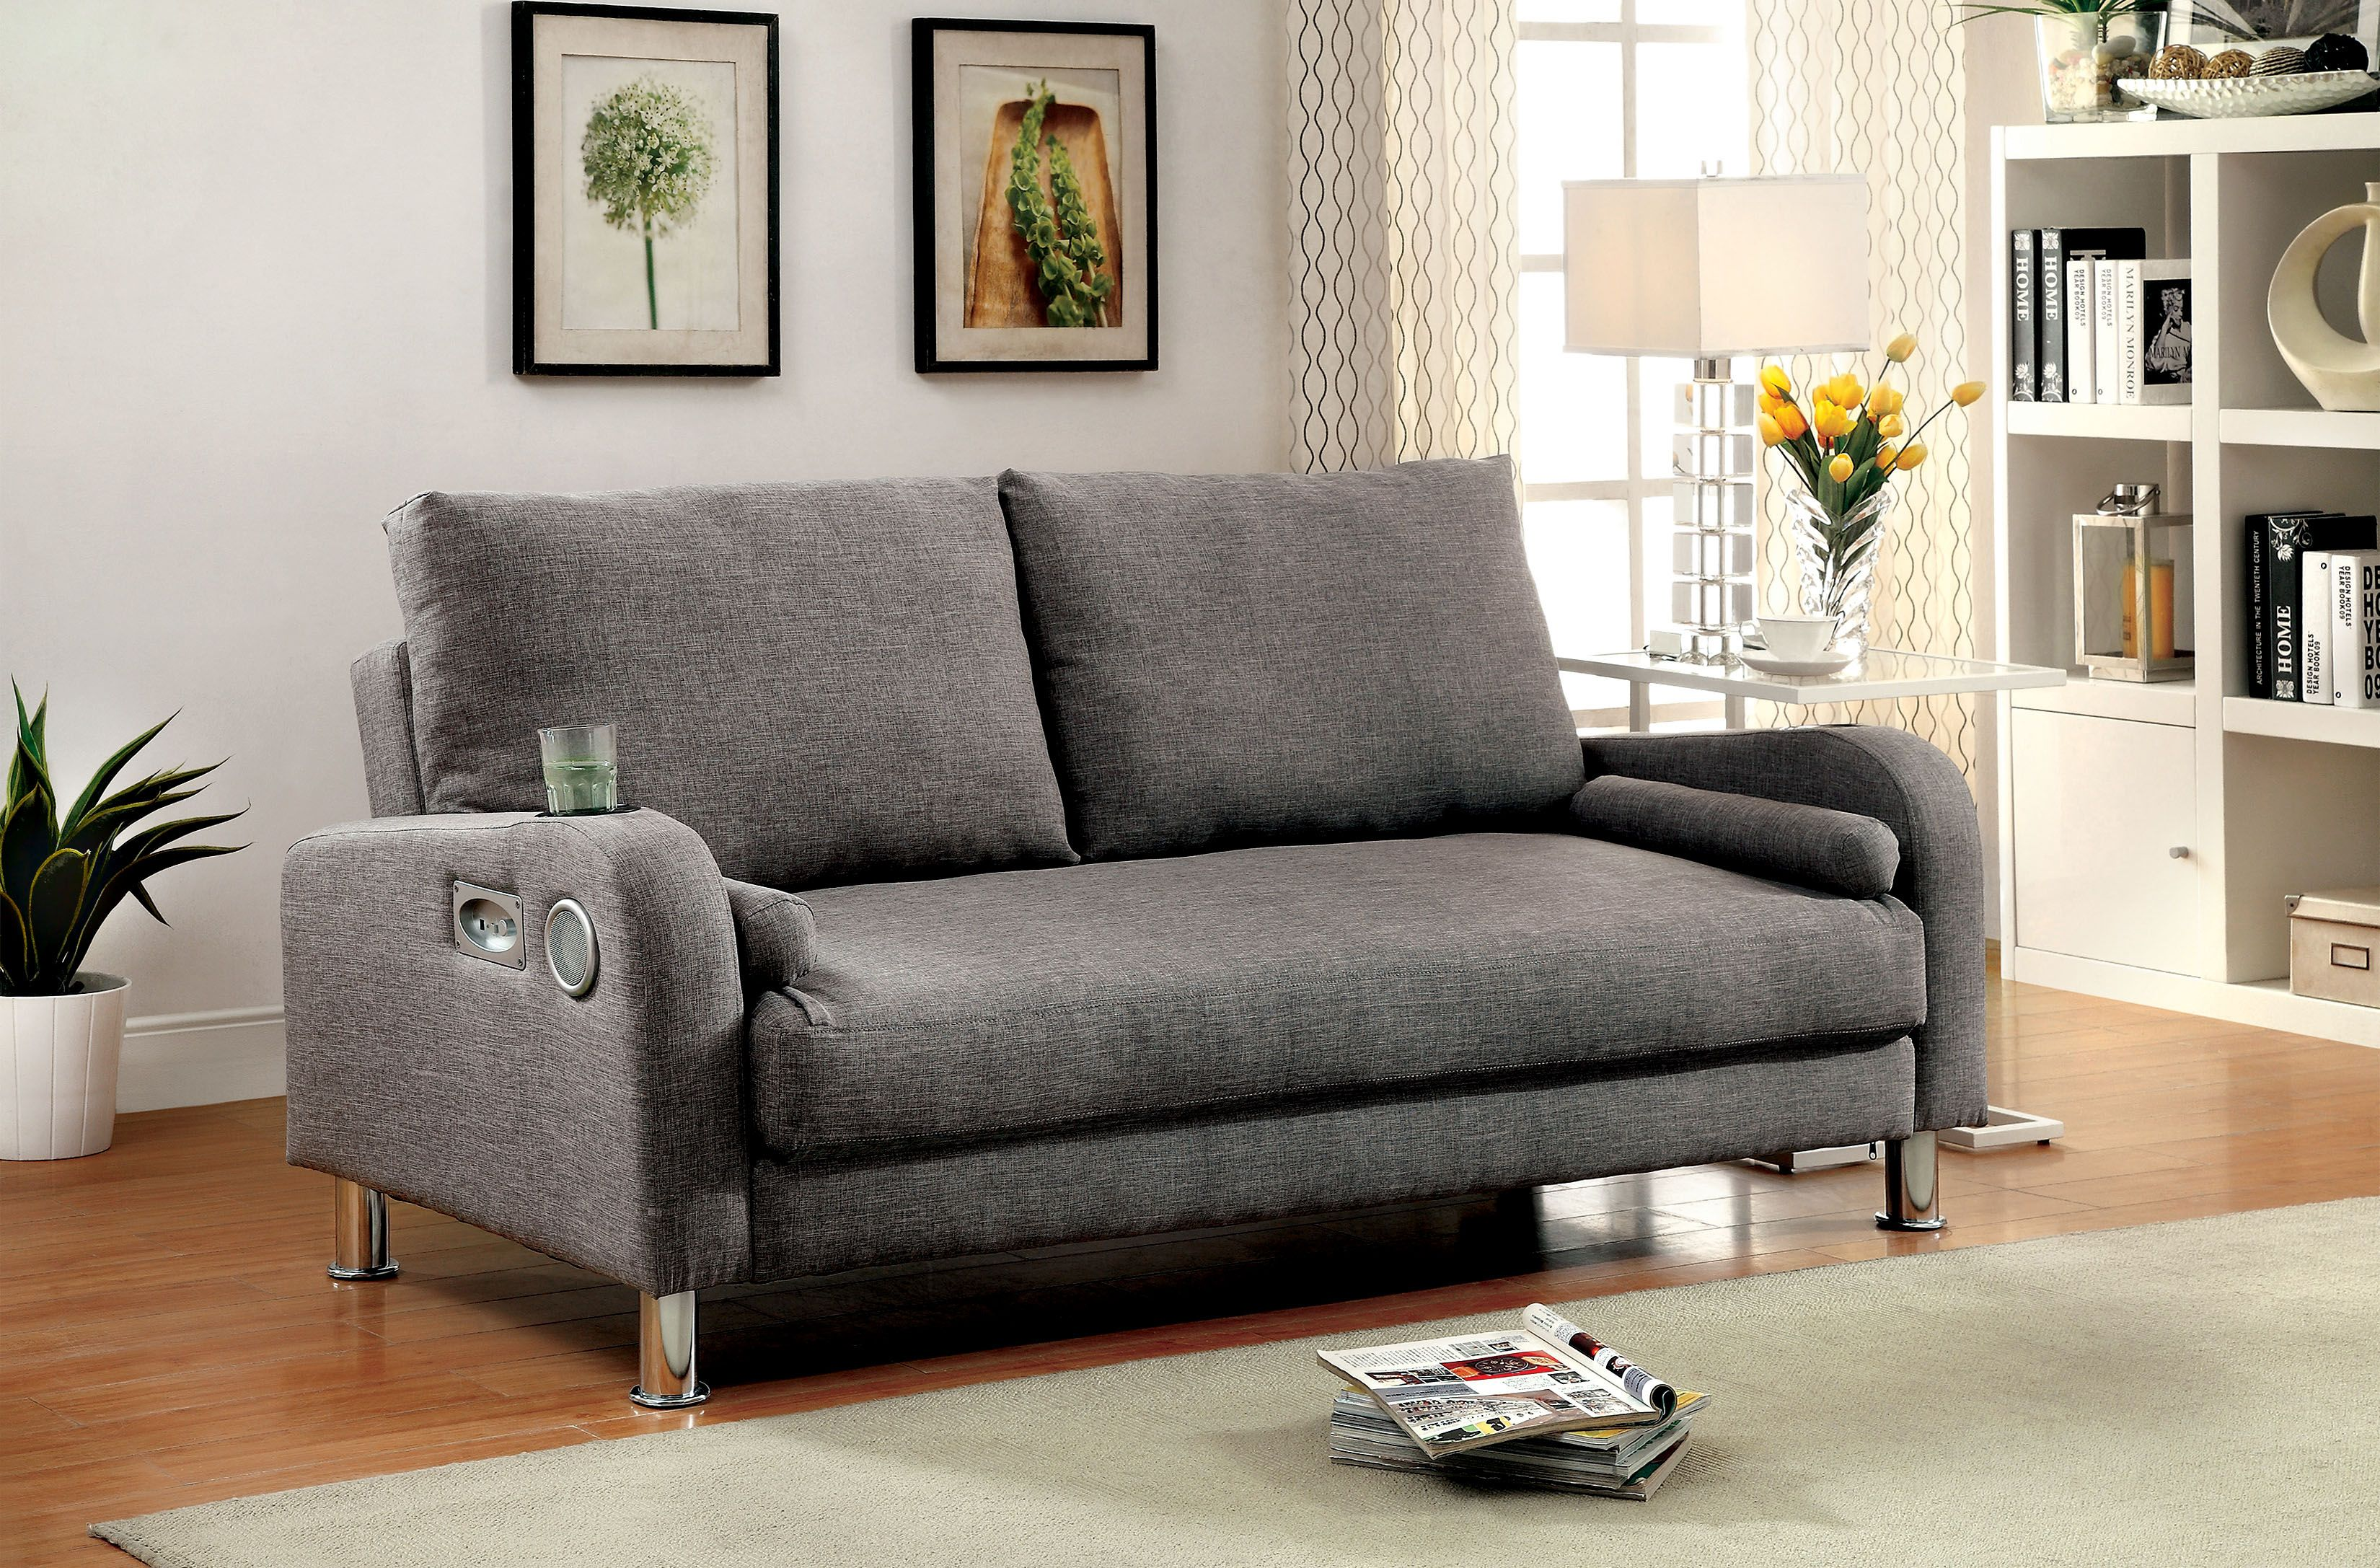 Serta Haiden Queen Sofa Bed Gray Walmart Com In 2020 Futon Living Room Futon Sofa Furniture Of America